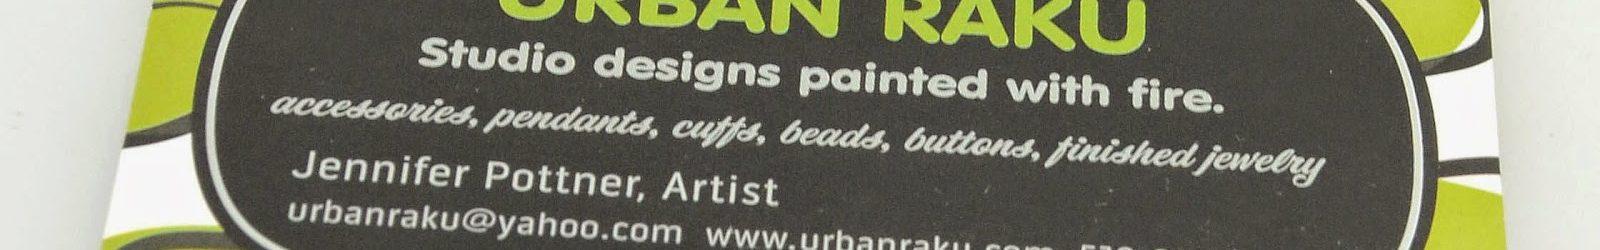 Special Treat if you love Raku Ceramic!